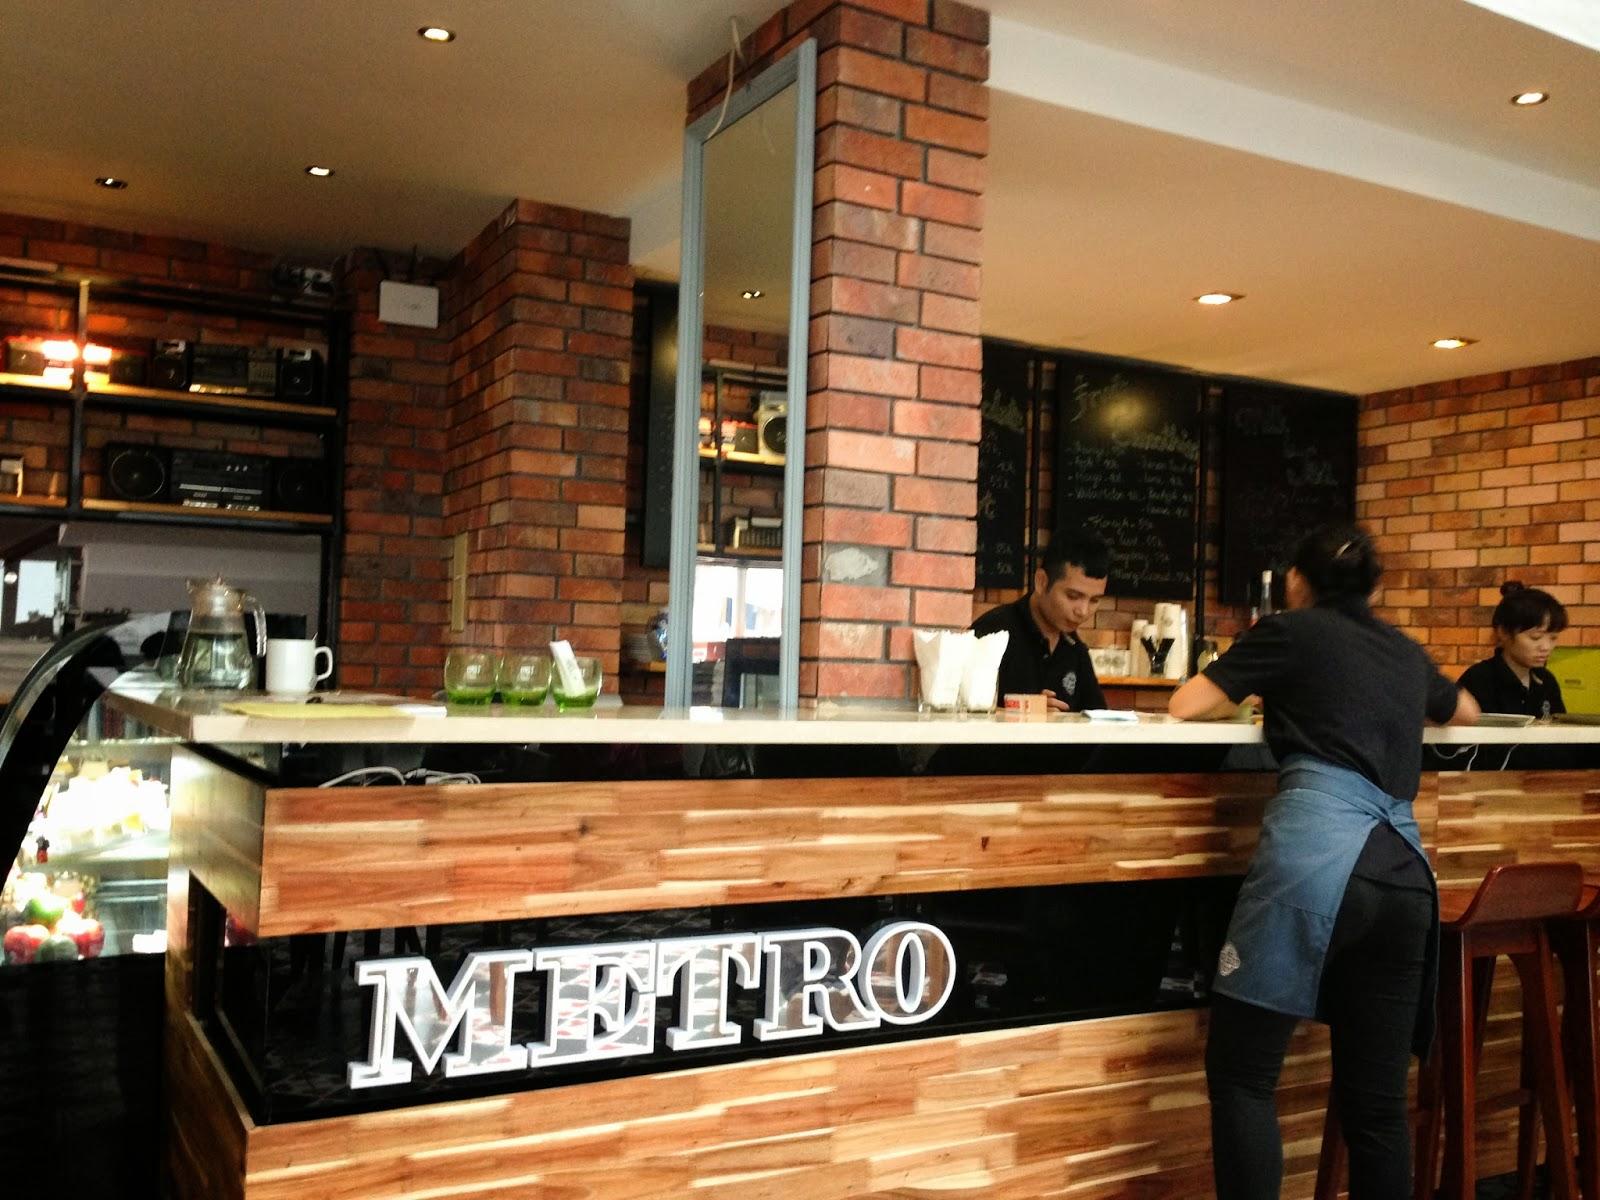 METROCAFE-hanoi-vietnam メトロカフェ店内